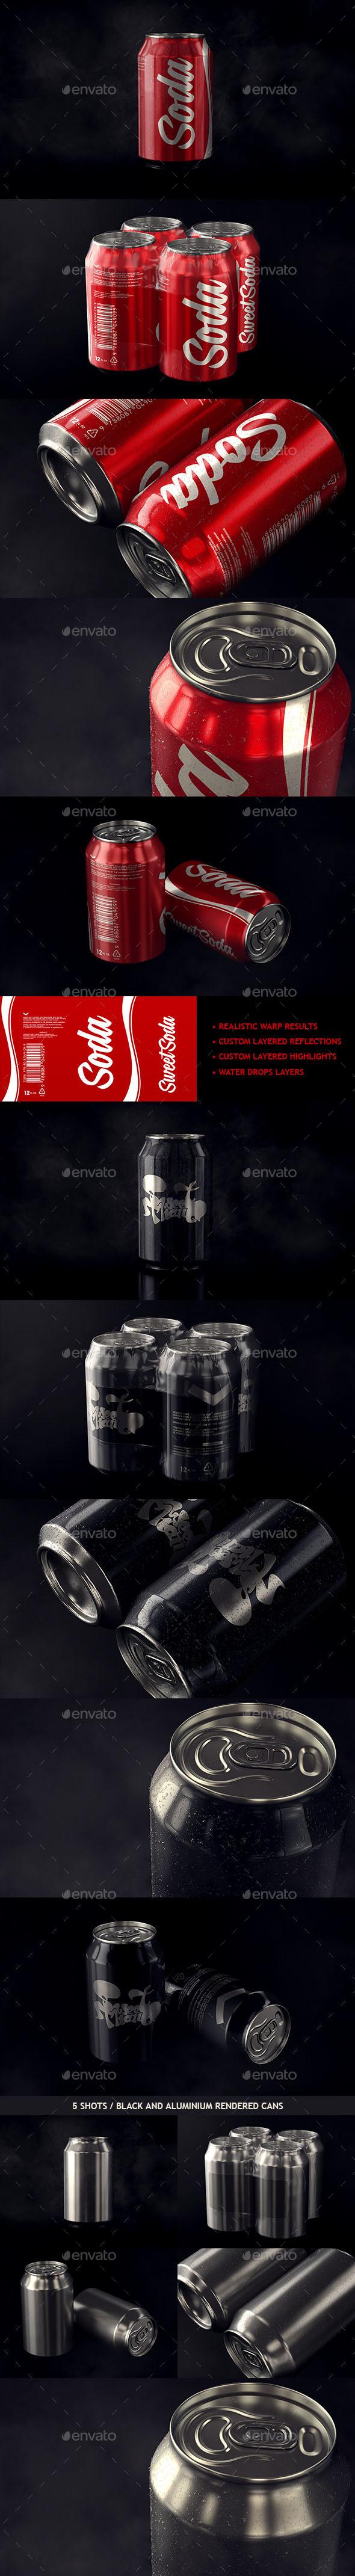 Photorealistic Aluminum Soda Can Mockup